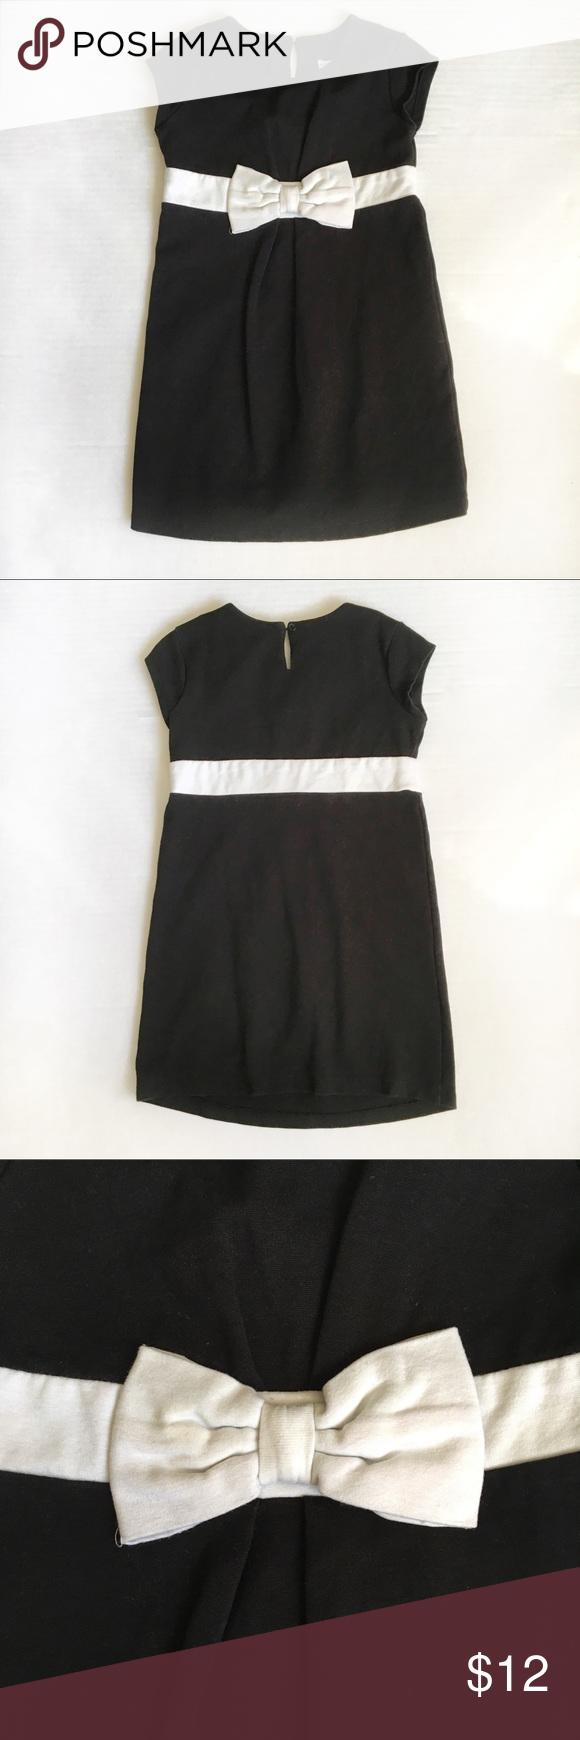 Old Navy Black Straight Dress 4t Straight Dress Clothes Design Dresses [ 1740 x 580 Pixel ]